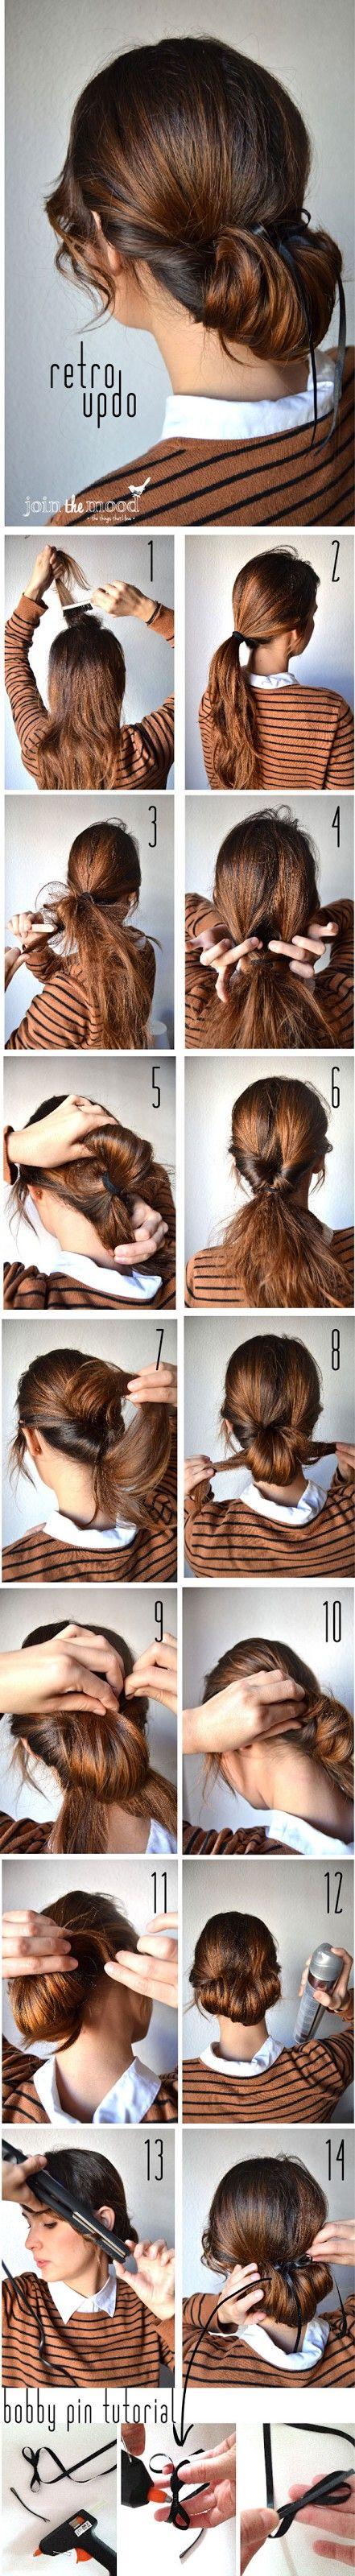 Make a retro updo hairstyles tutorial hair pinterest retro